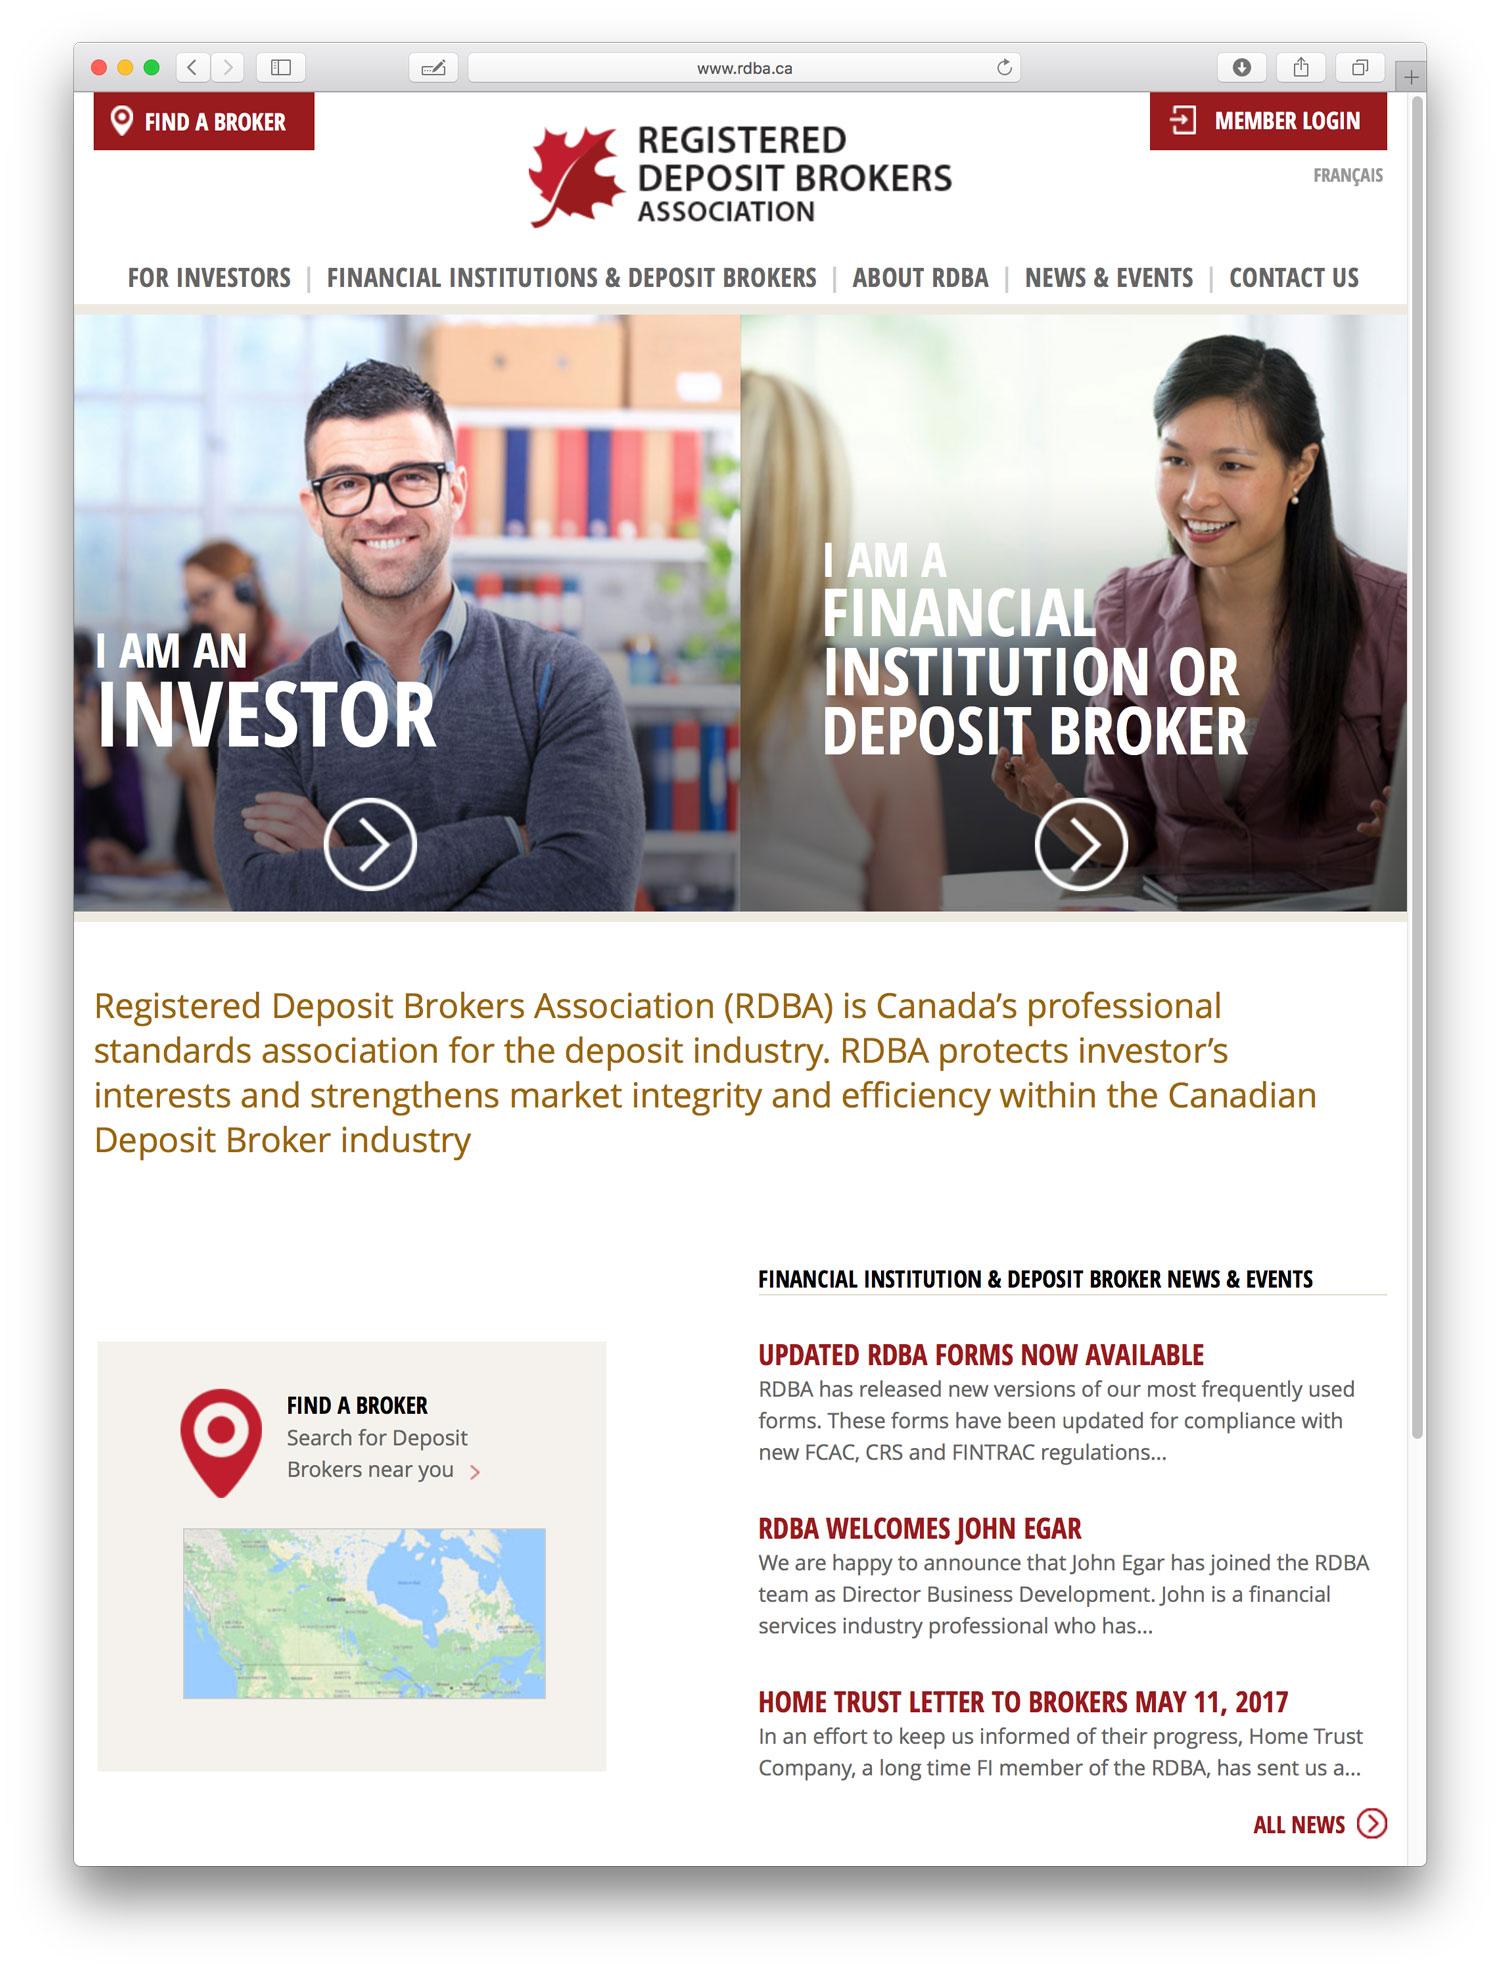 Association website design for RDBA showing home page